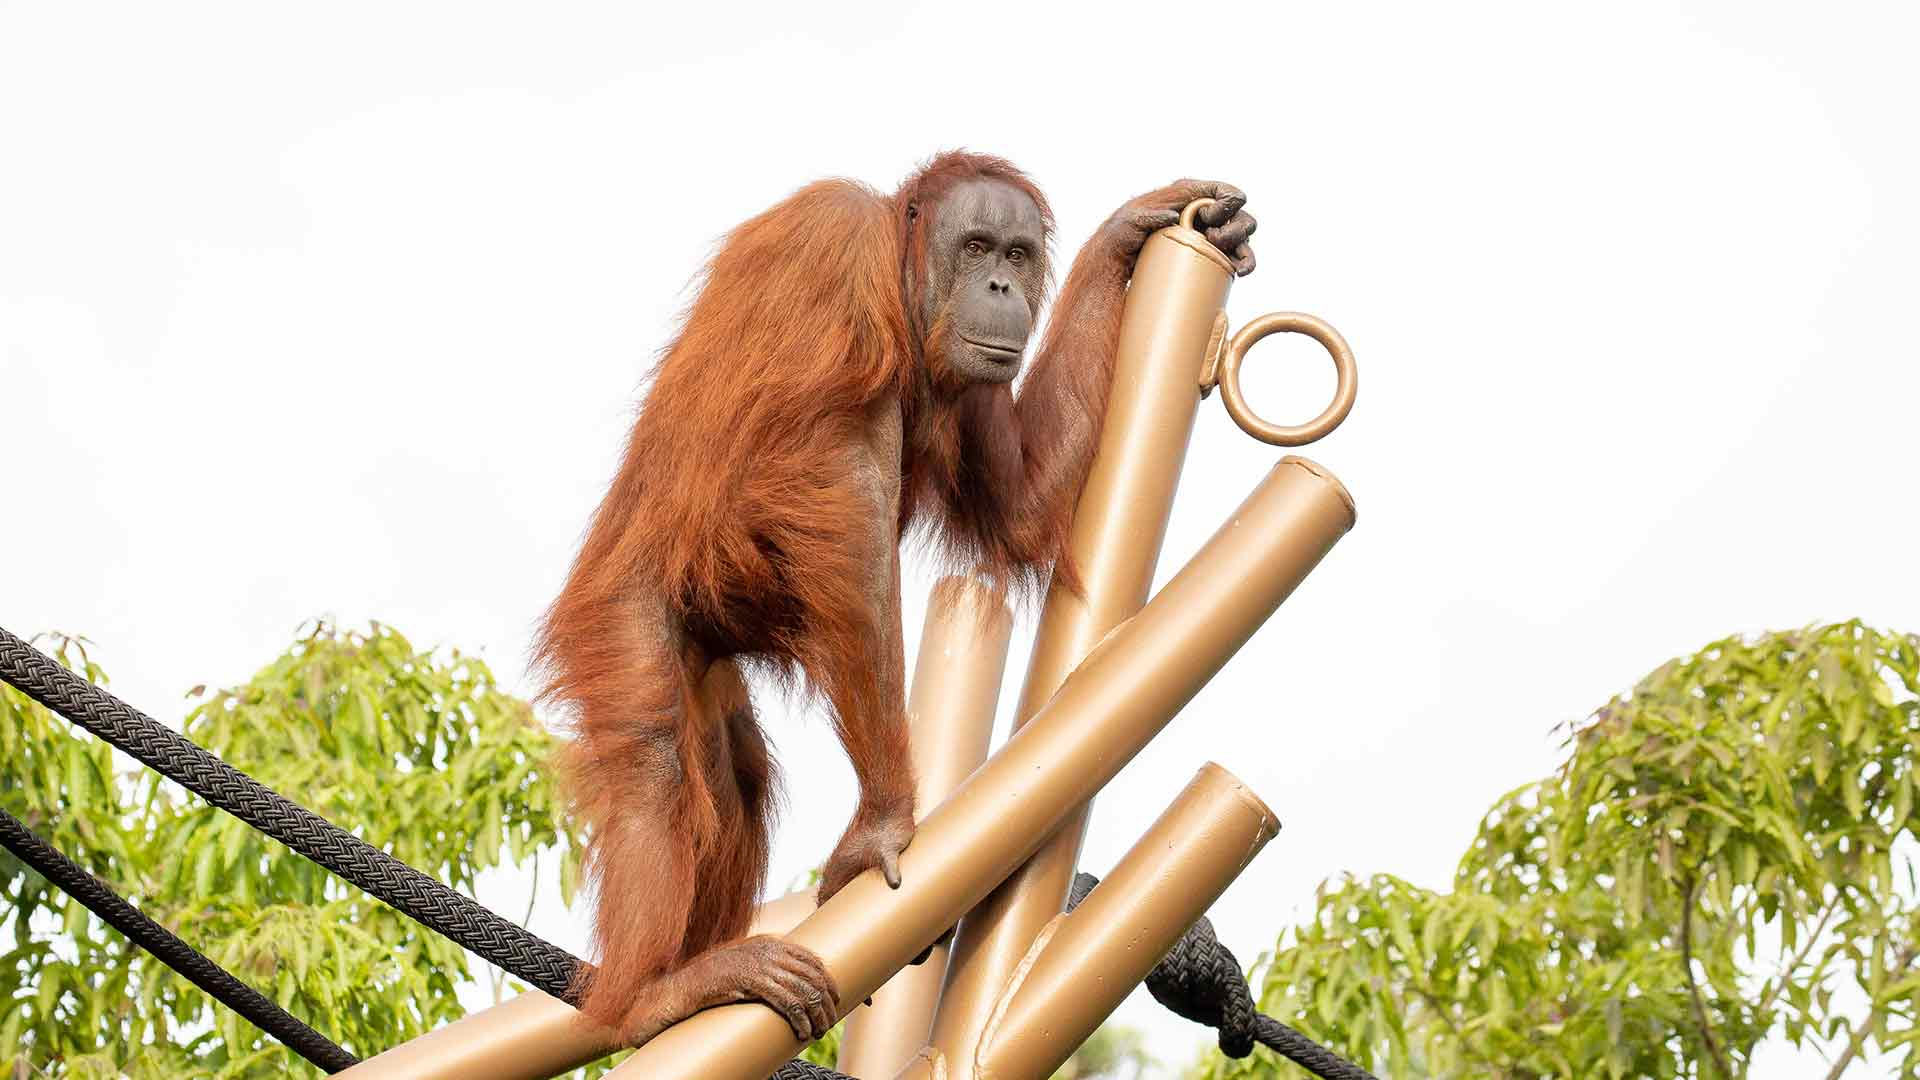 https://rfacdn.nz/zoo/assets/media/orangutan-move-gallery-8.jpg